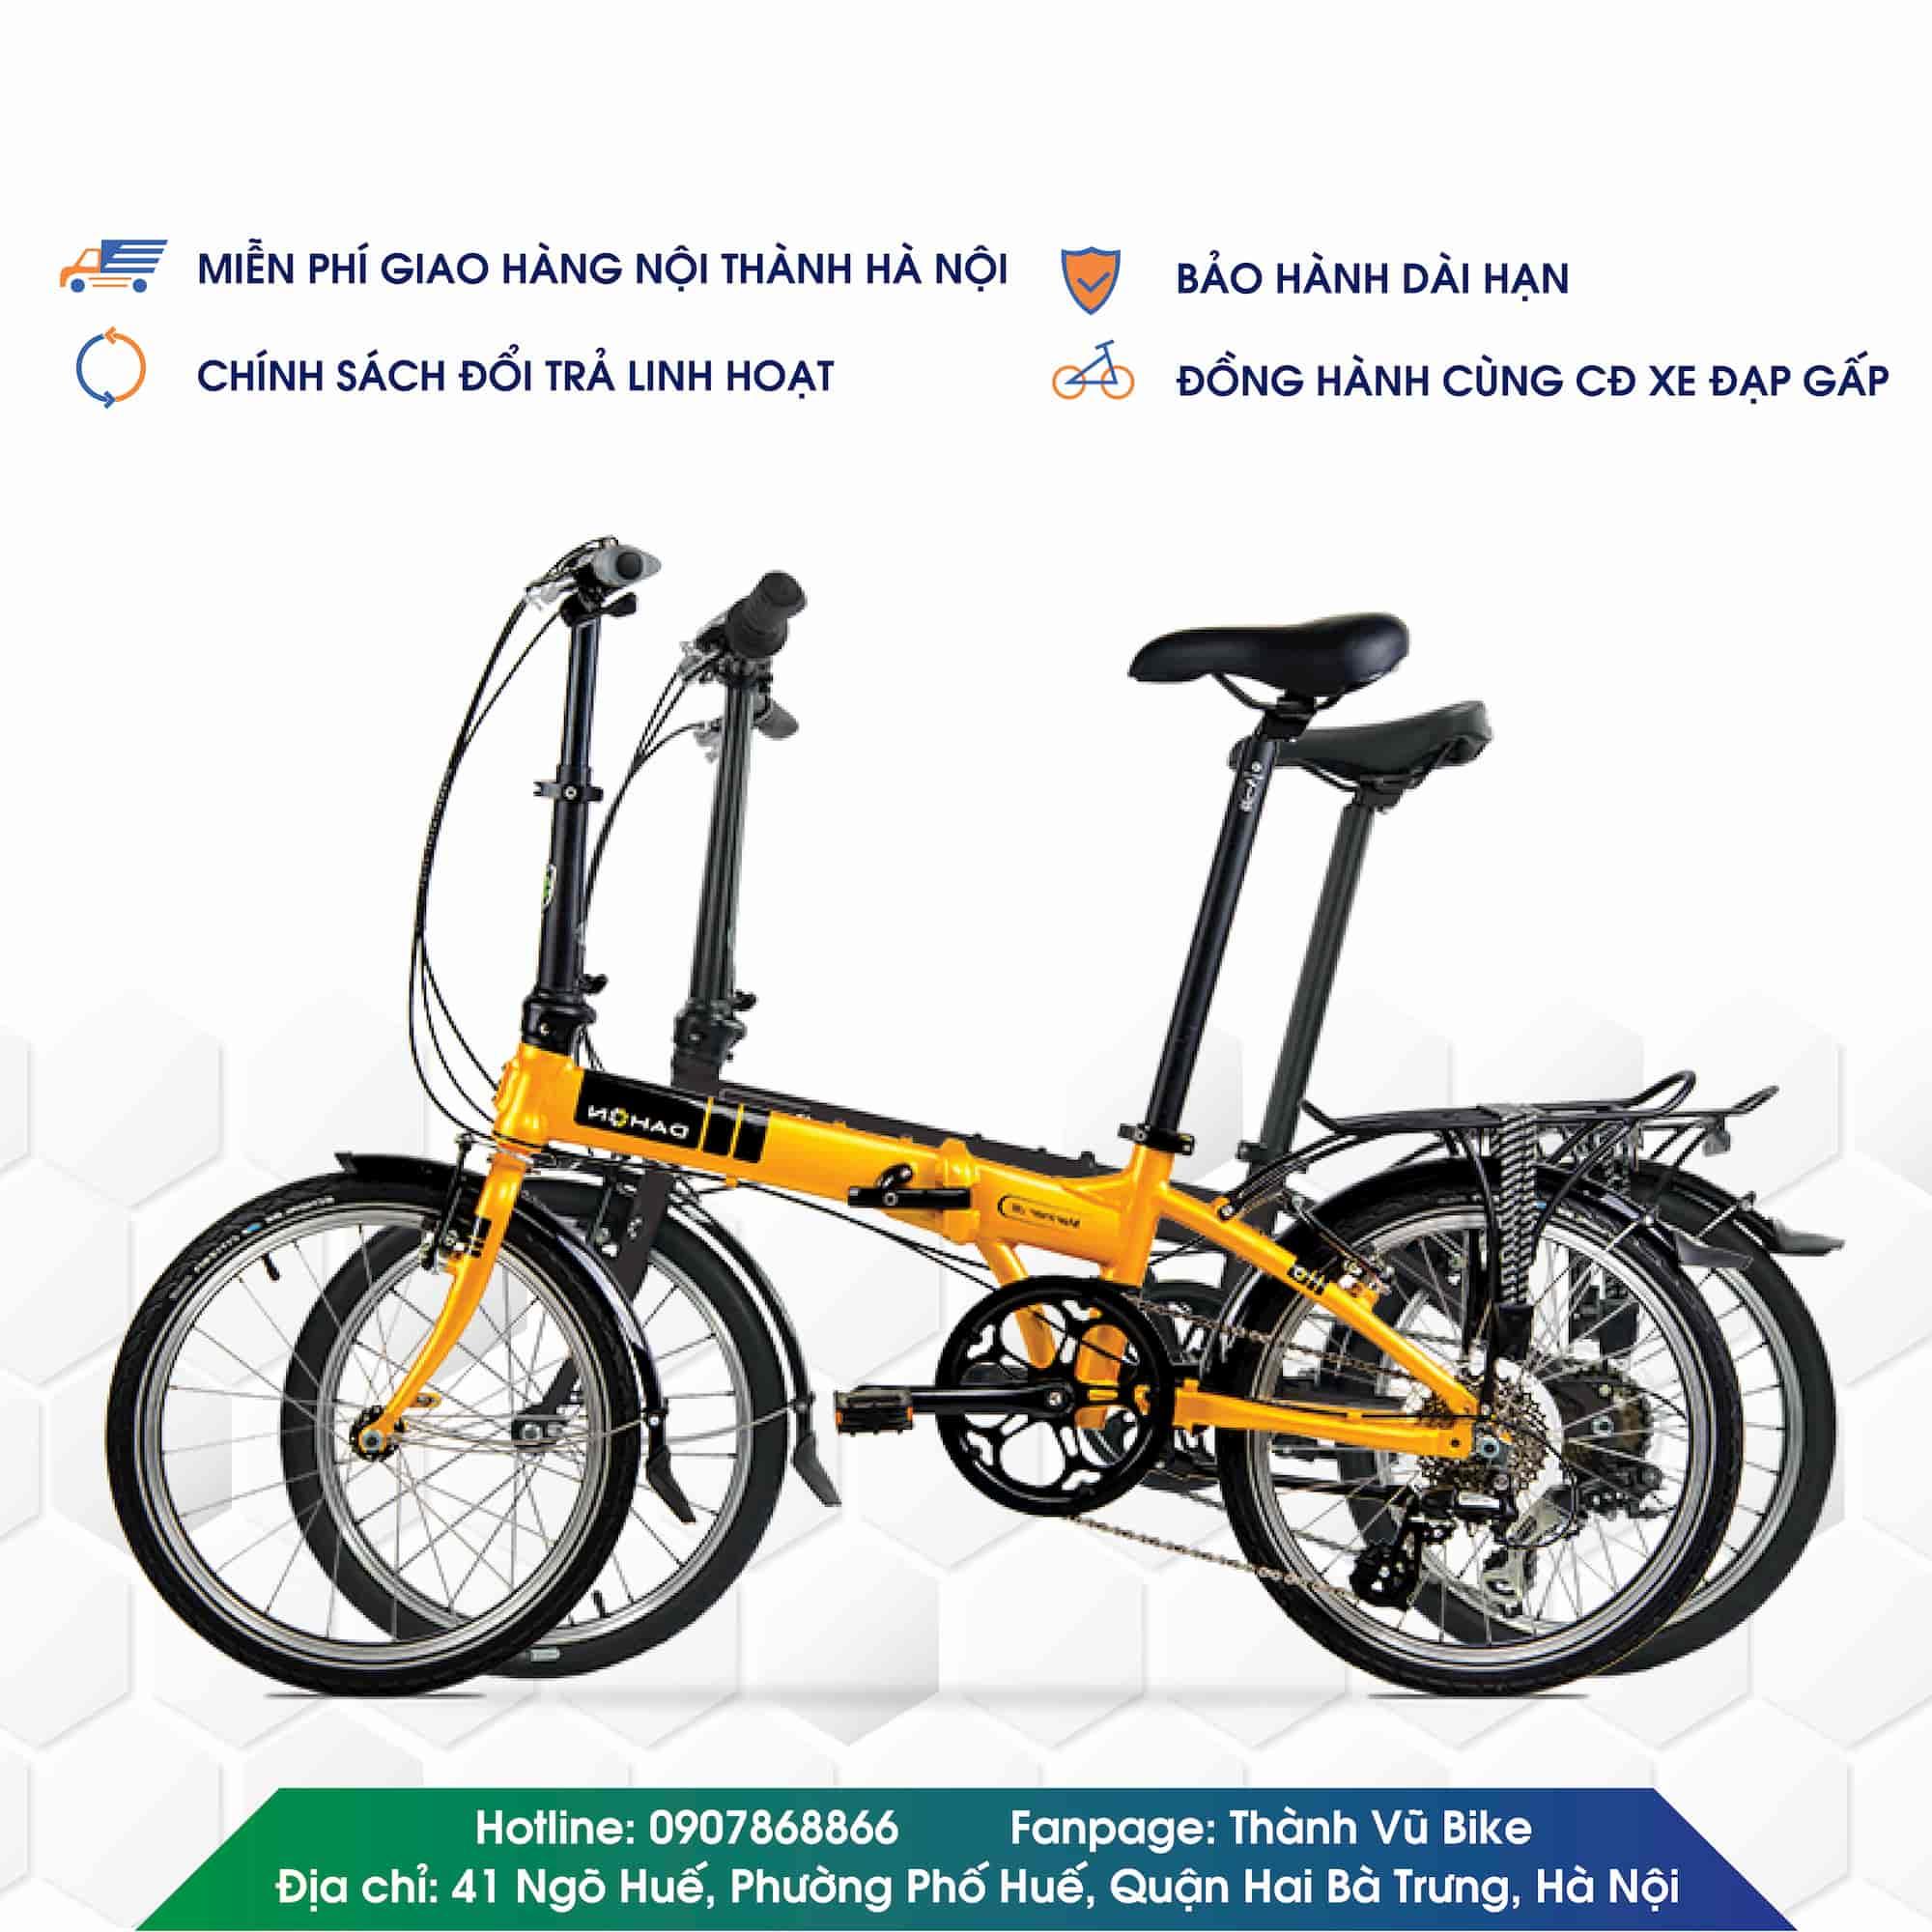 thanhvubike-banner-mobile-02